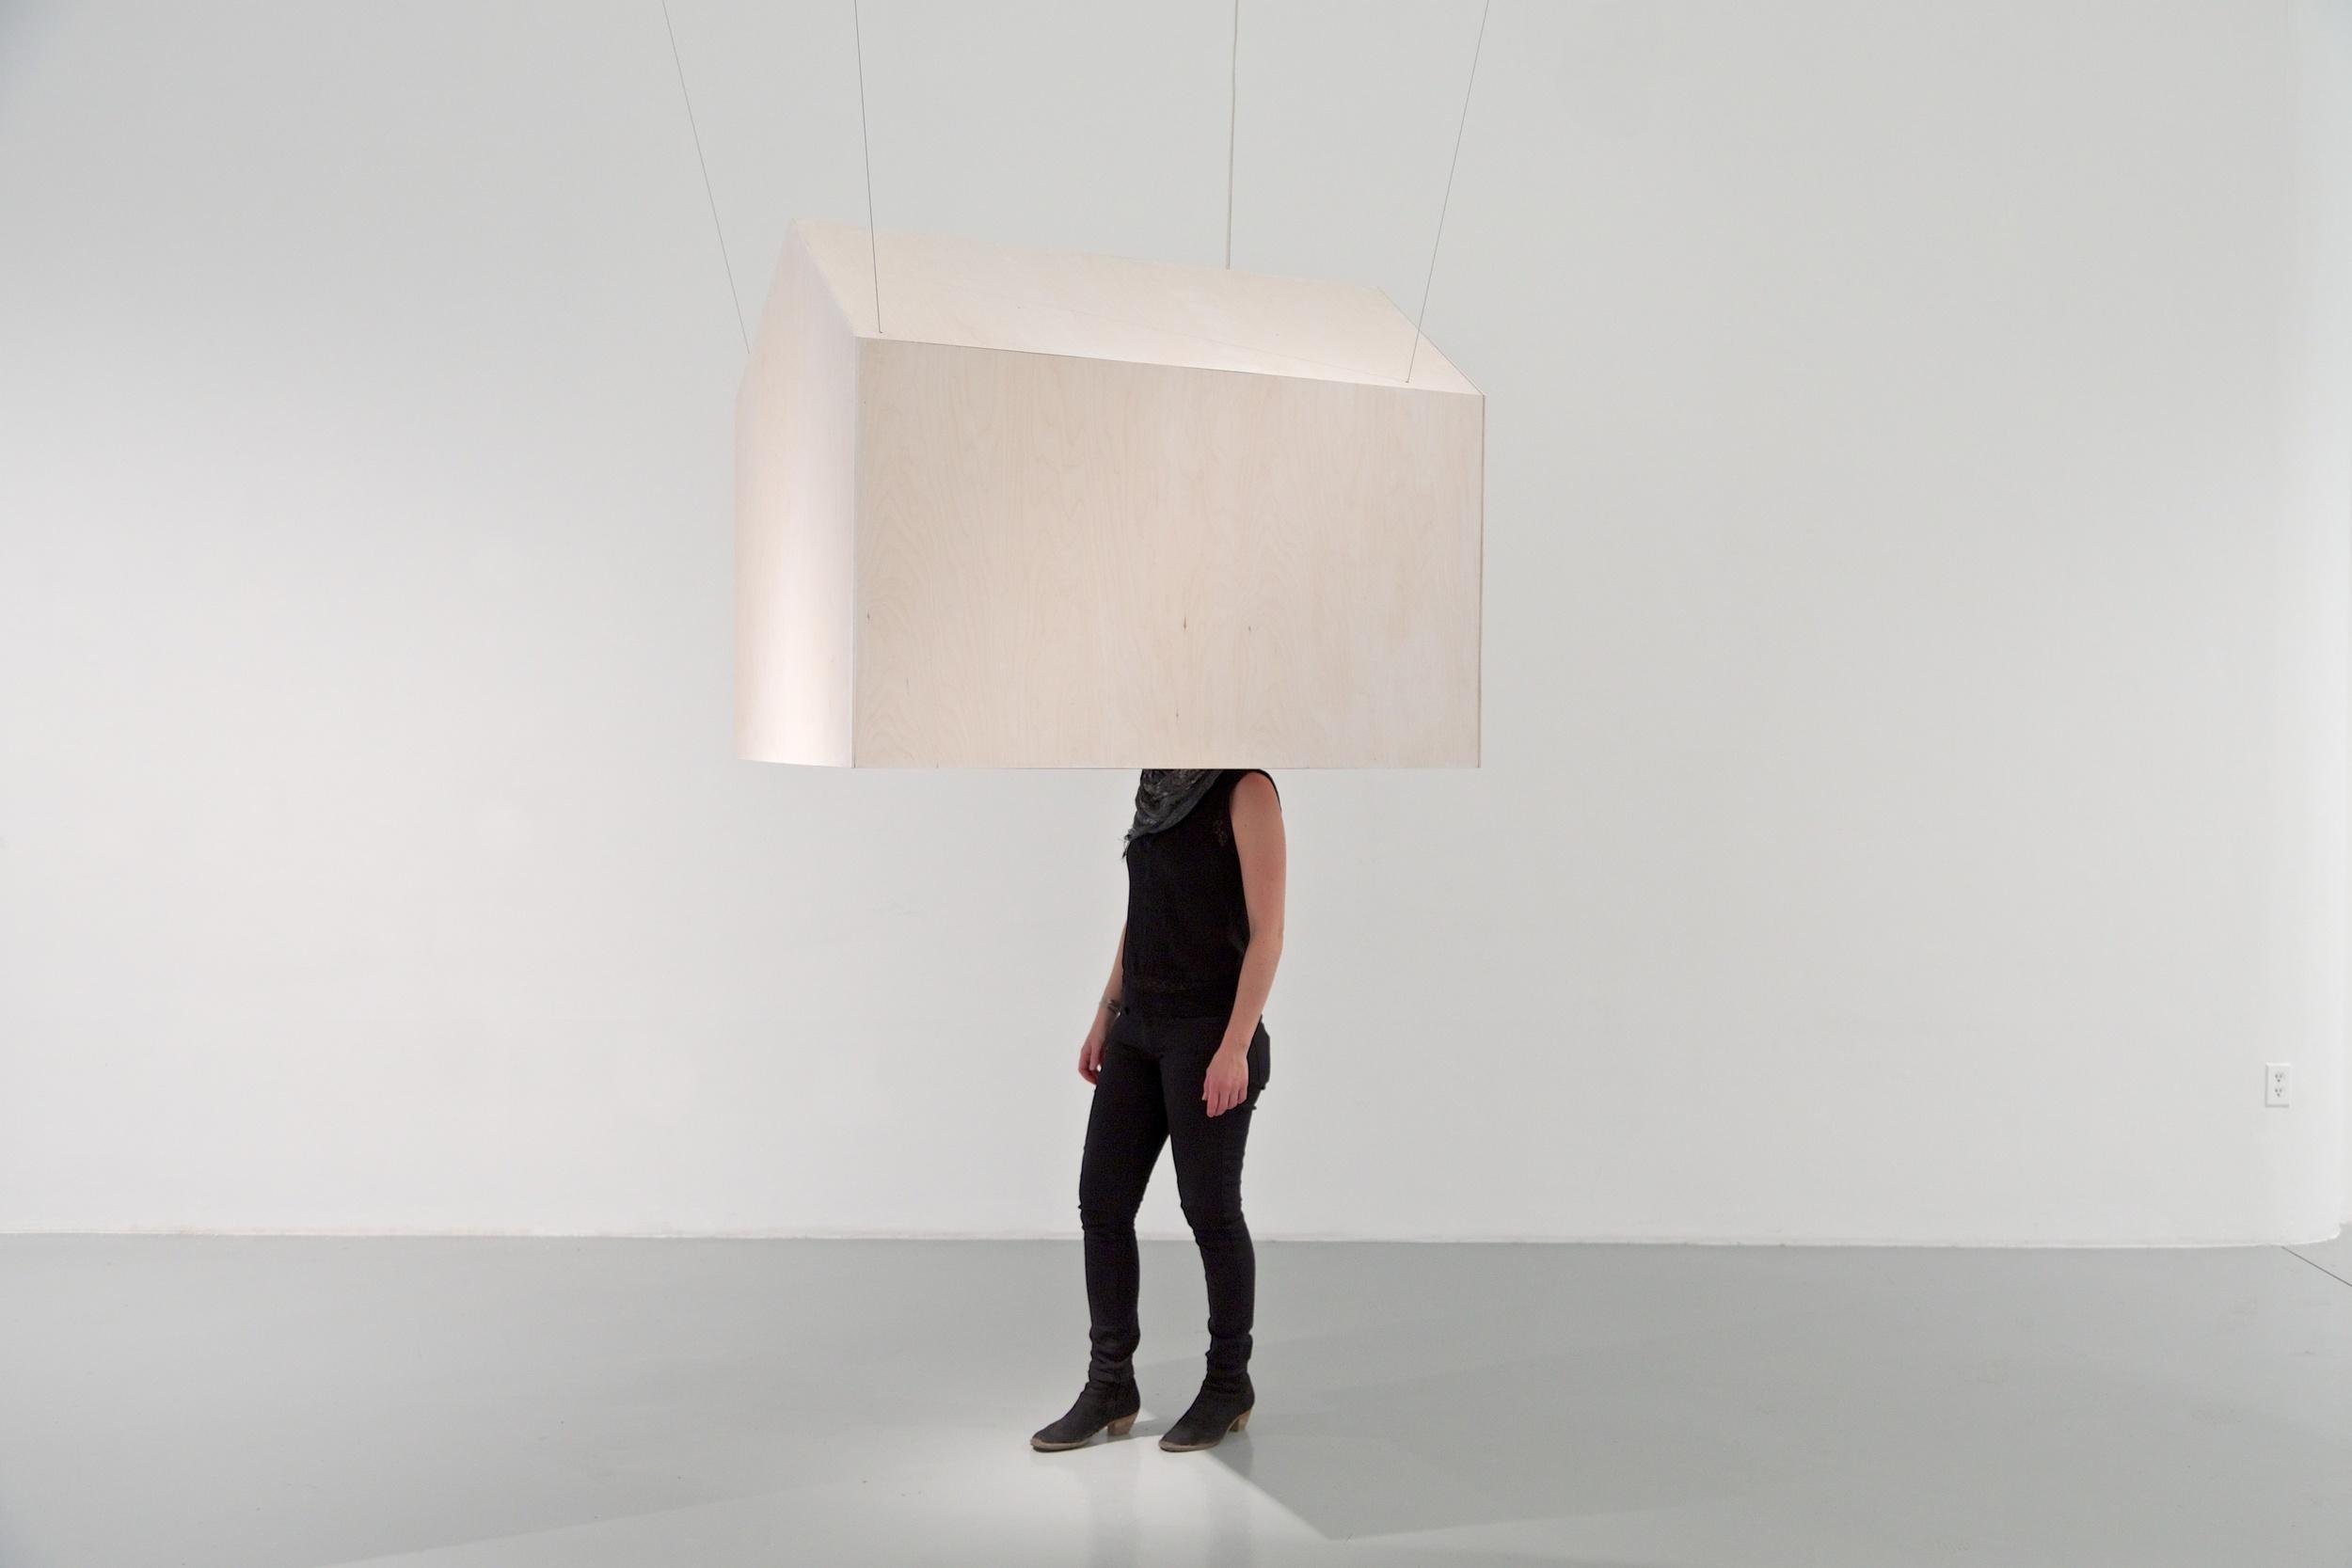 Voluntary Confinement: House.  2014 [immersive sculpture]